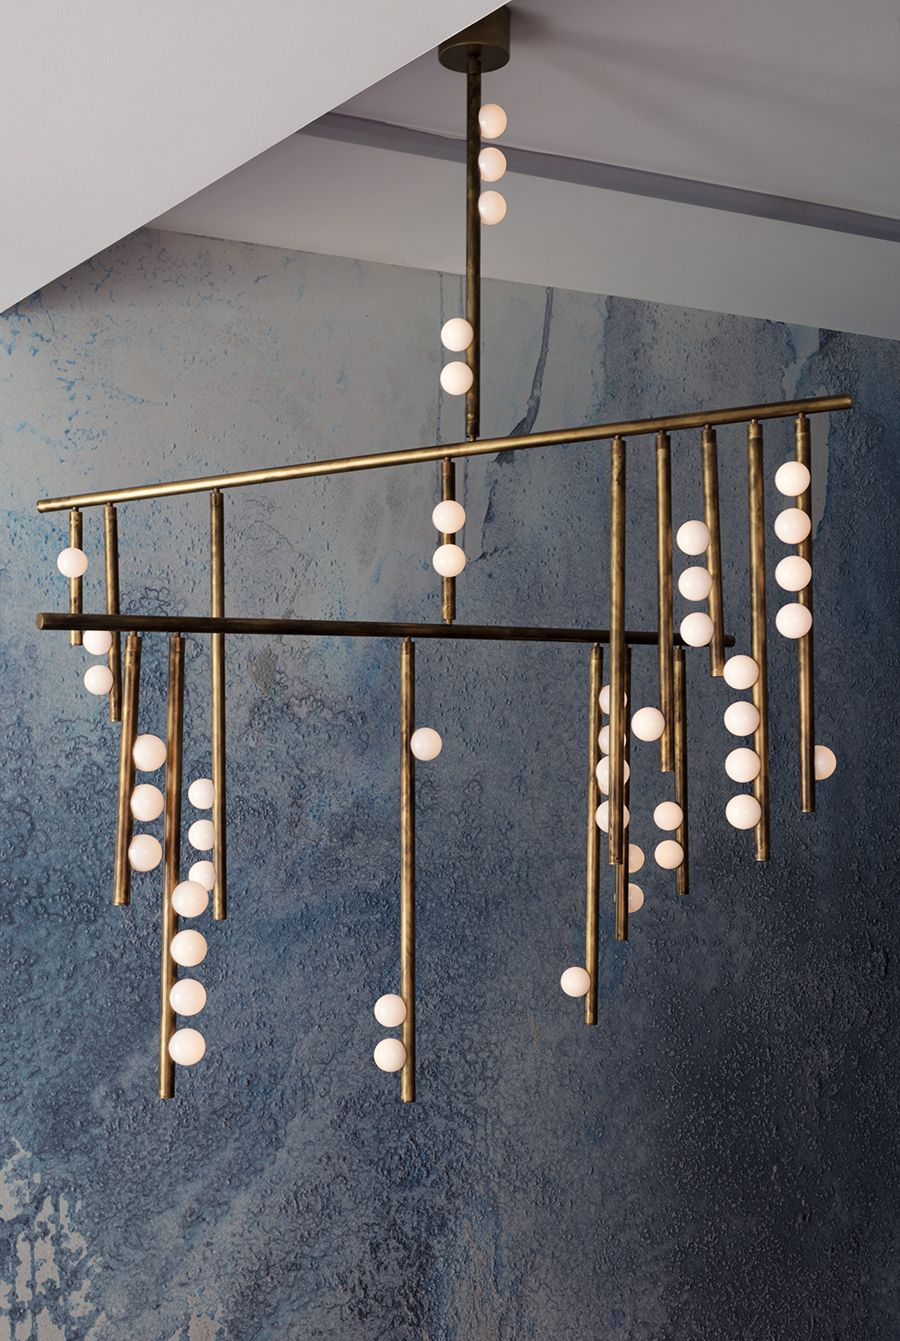 Modern Branch Chandelier Glass Balls Magic Beams Pendant Lamp Light Luxury Loft Lighting Fixture Living Room Decoration Lindsey Chandeliers Lights & Lighting